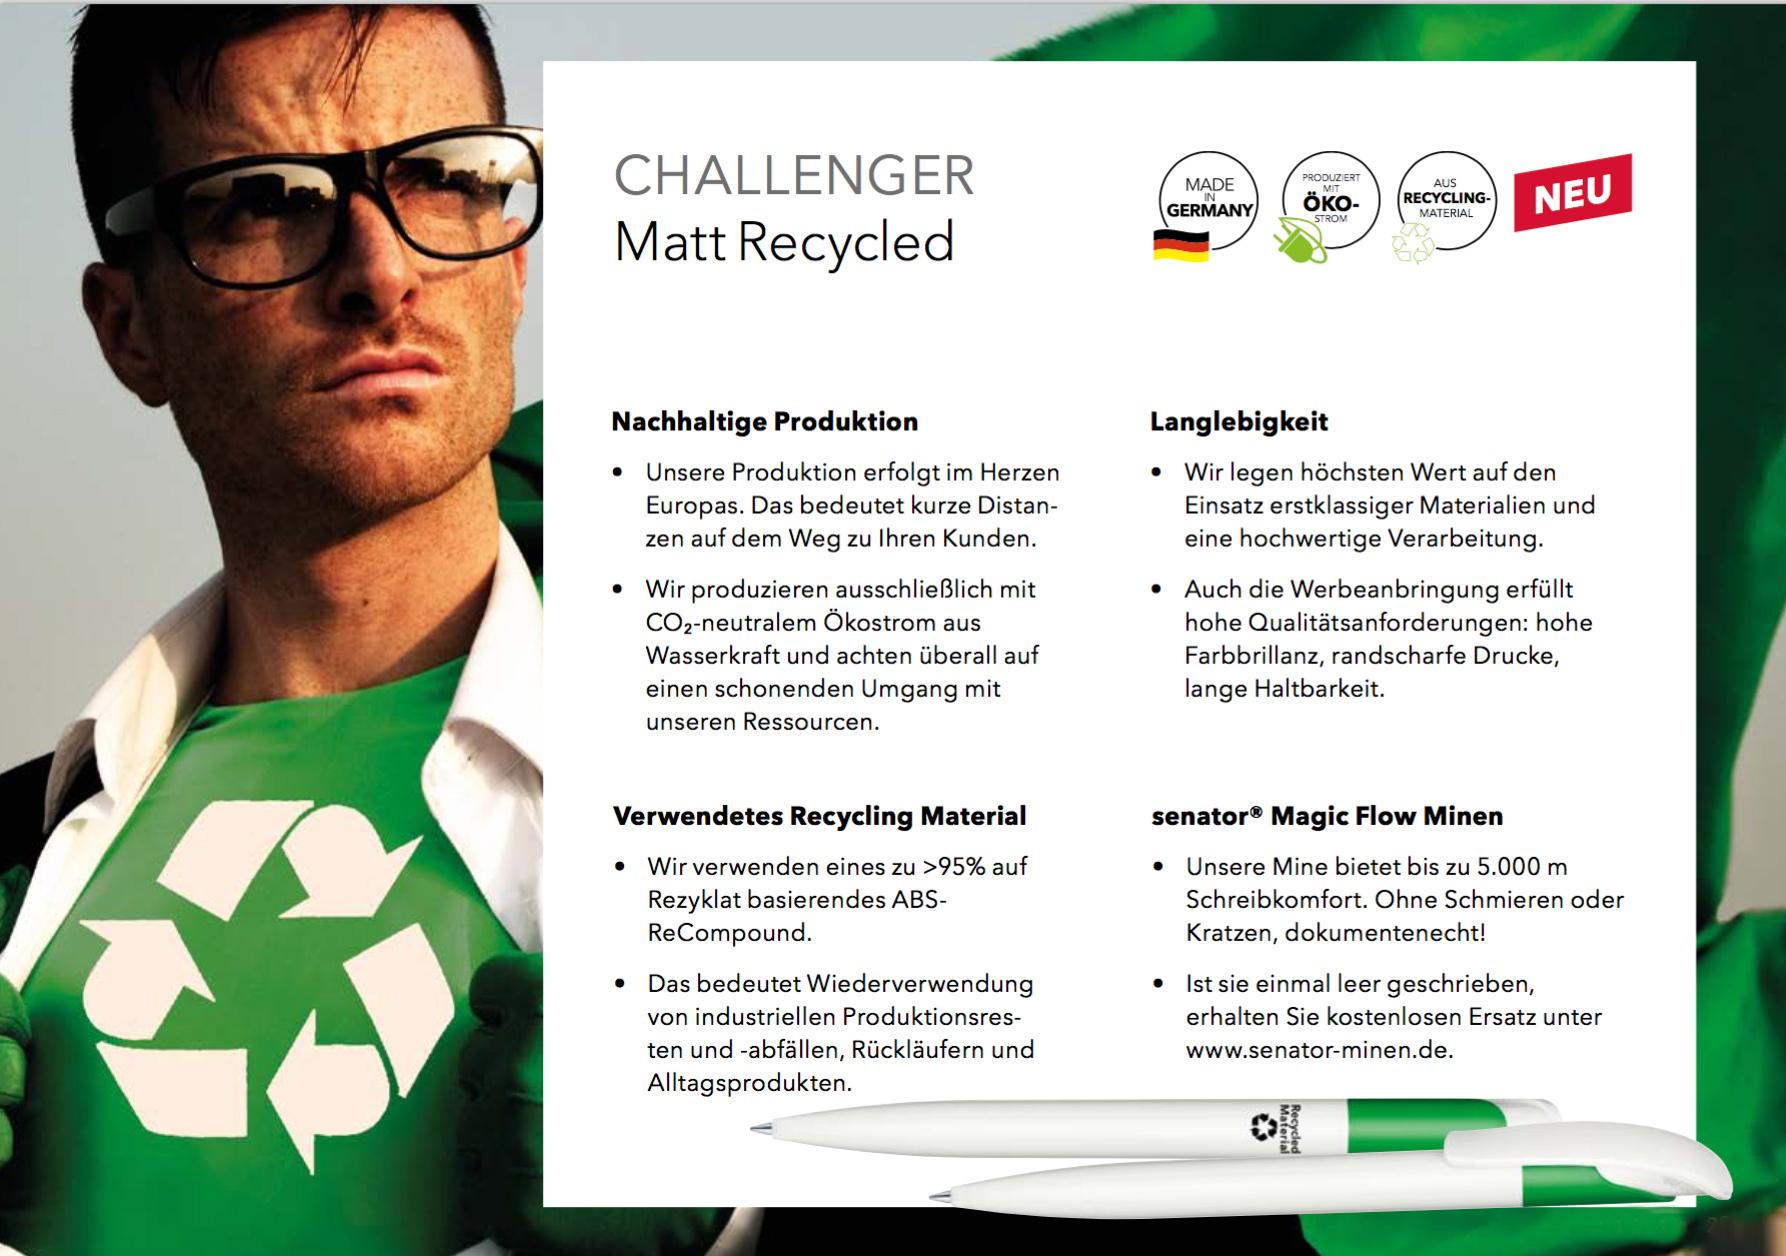 Senator Kugelschreiber Evoxx Polished Recycled